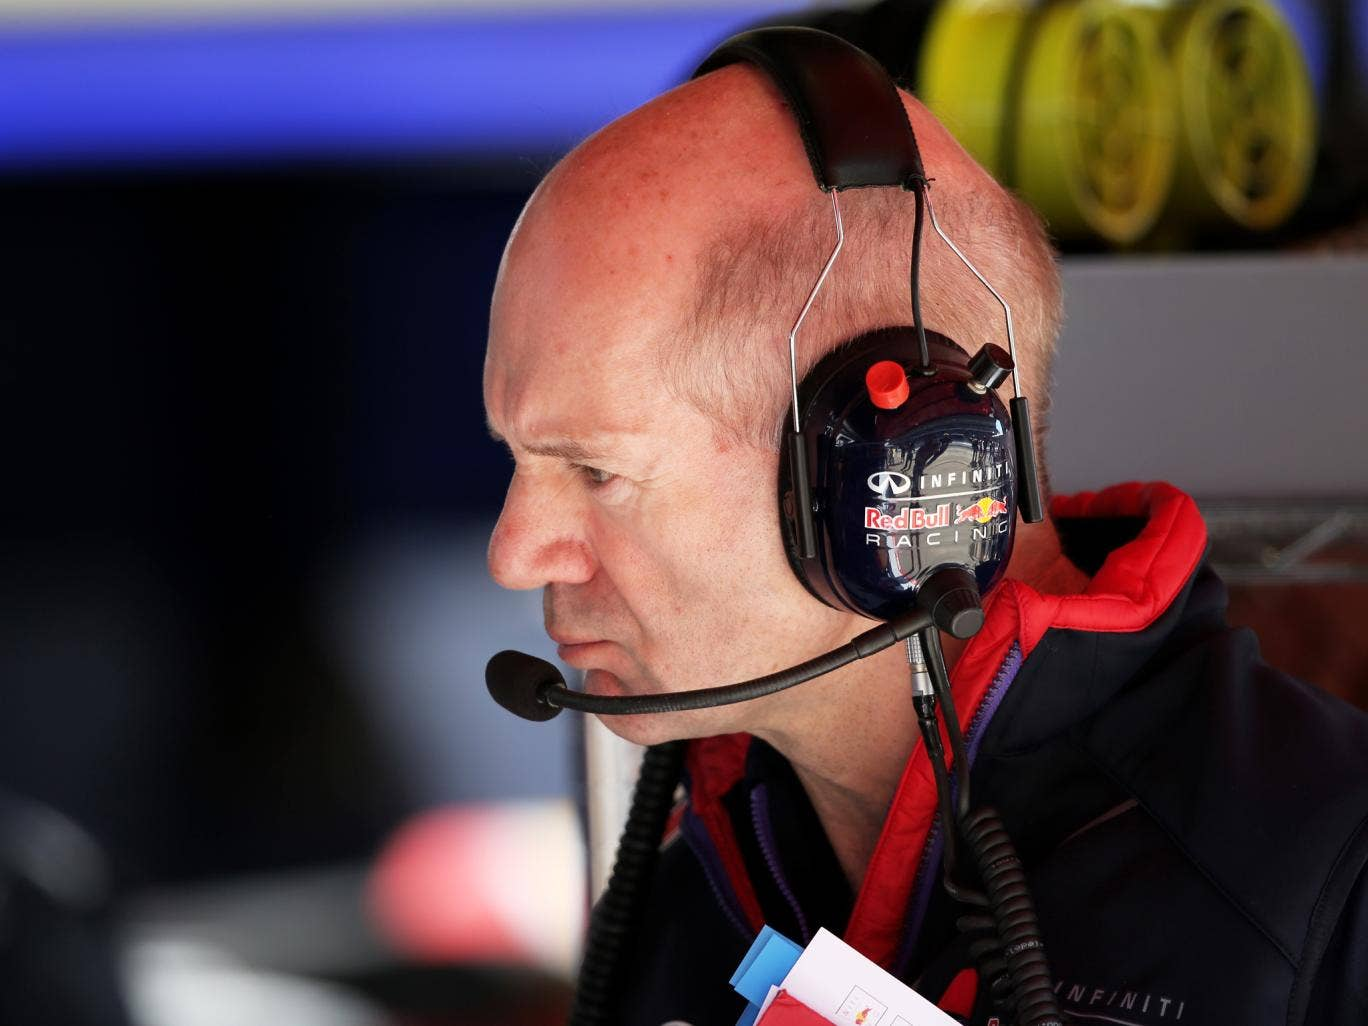 Adrian Newey has rejected talk of a move to Ferrari